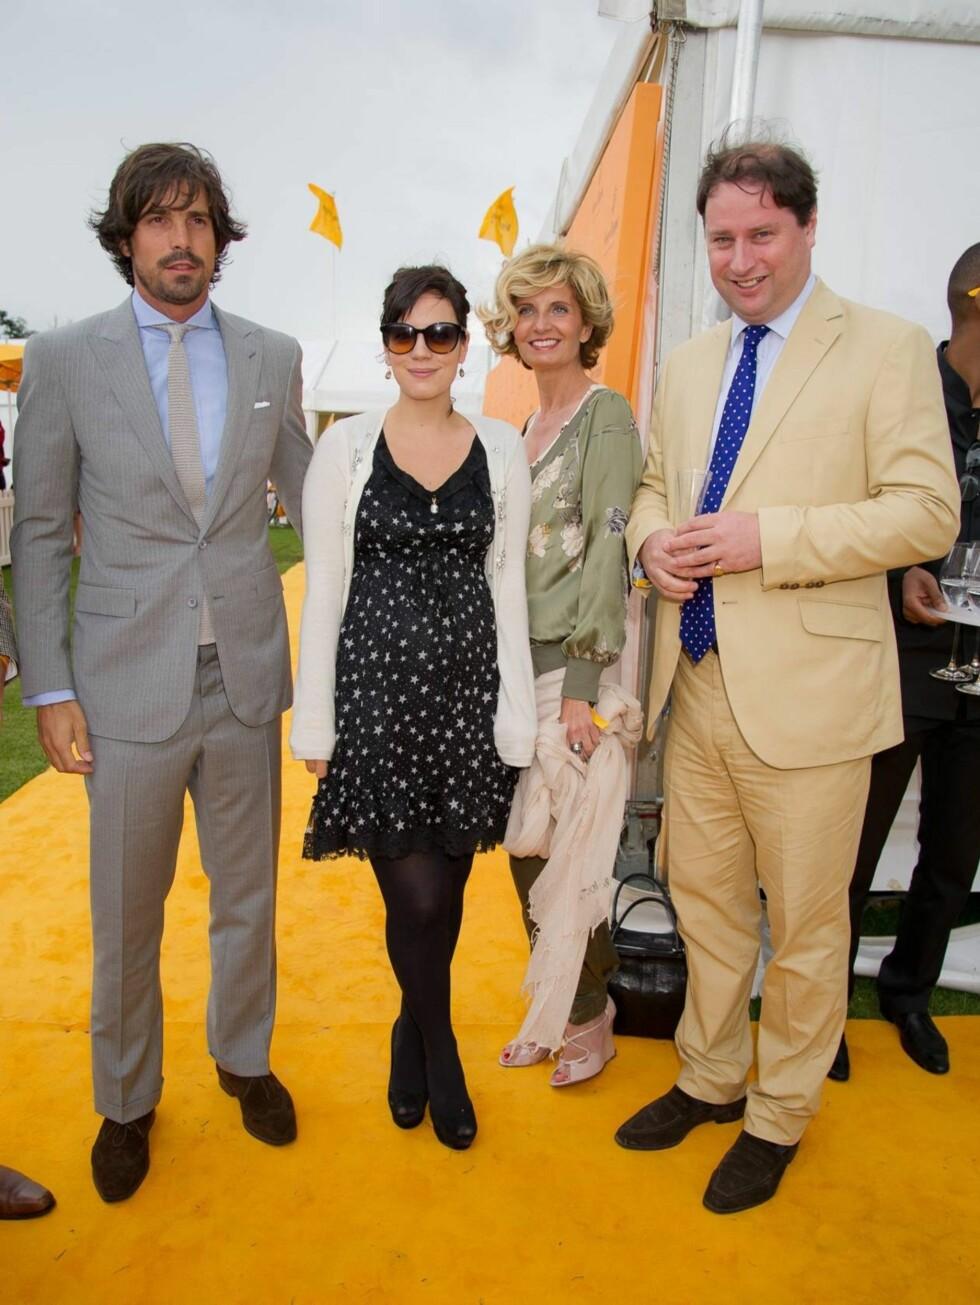 KOSTE SEG SAMMEN: Lily Allen, Sabina Belli og Jo Thornton var alle på plass på Cowdray Park Polo Club 17. juli. Foto: All Over Press